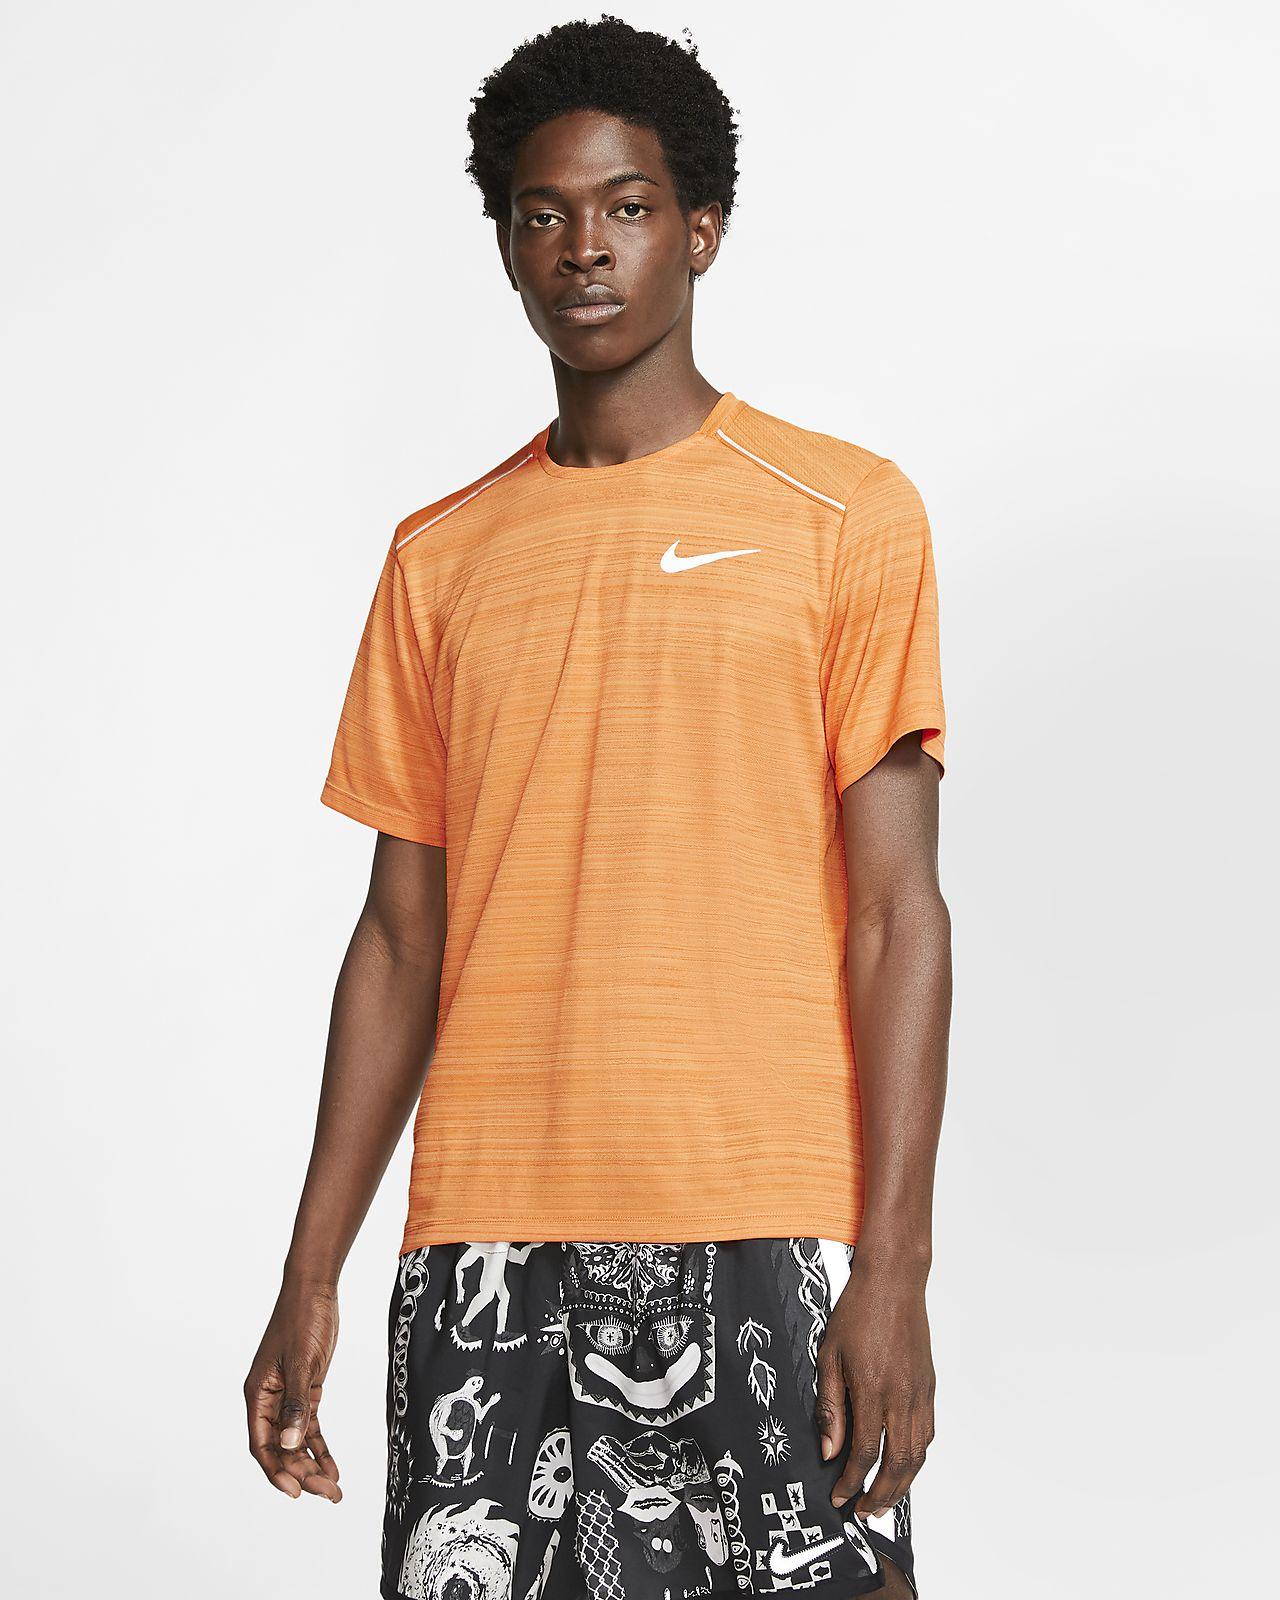 Nike Dri-FIT Miler Men's Short-Sleeve